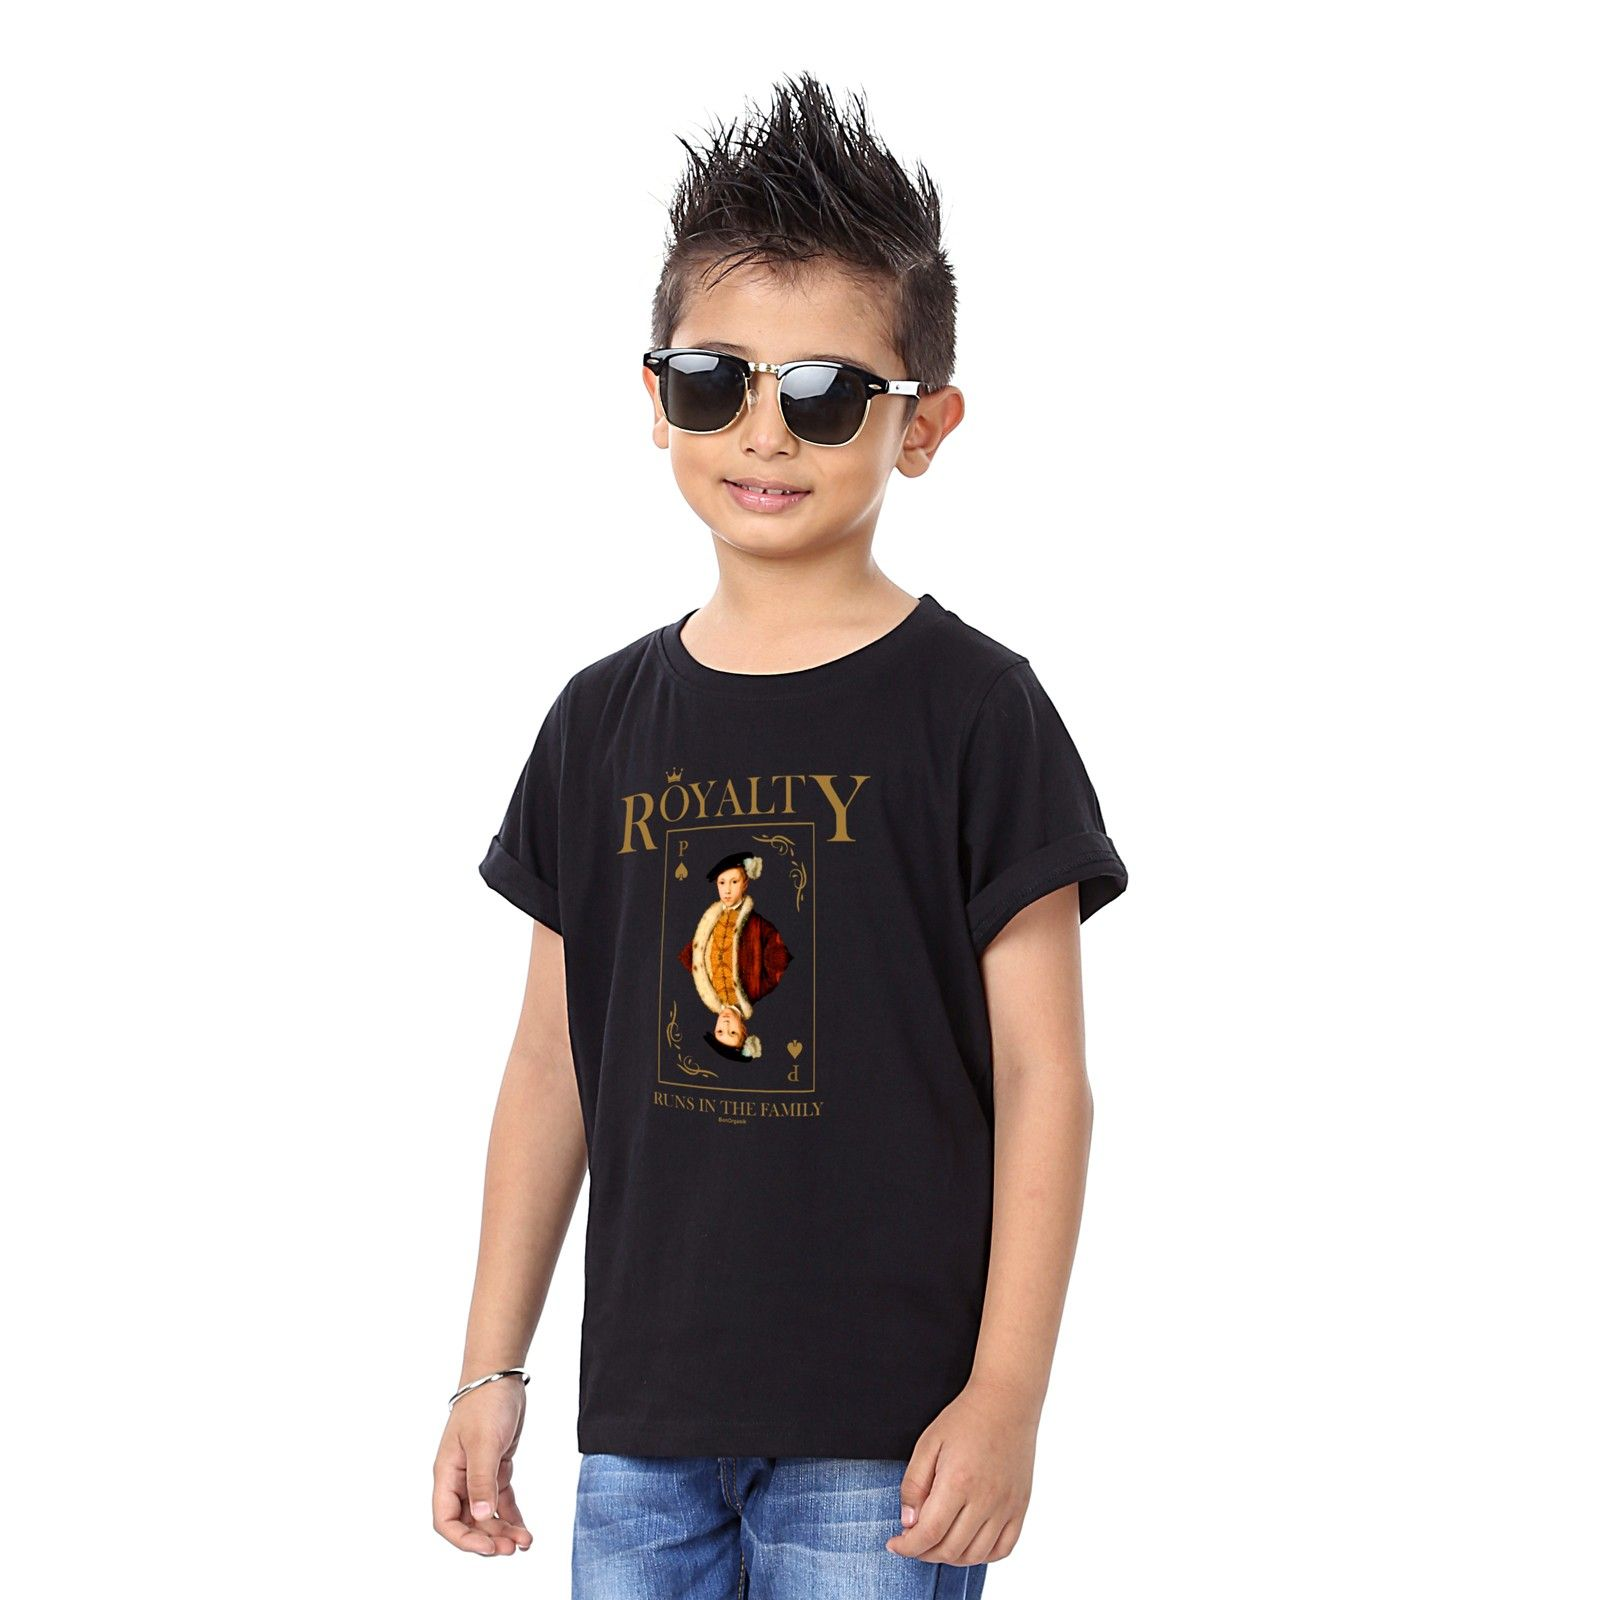 Boy's Royalty Print Black T-shirt - BonOrganik